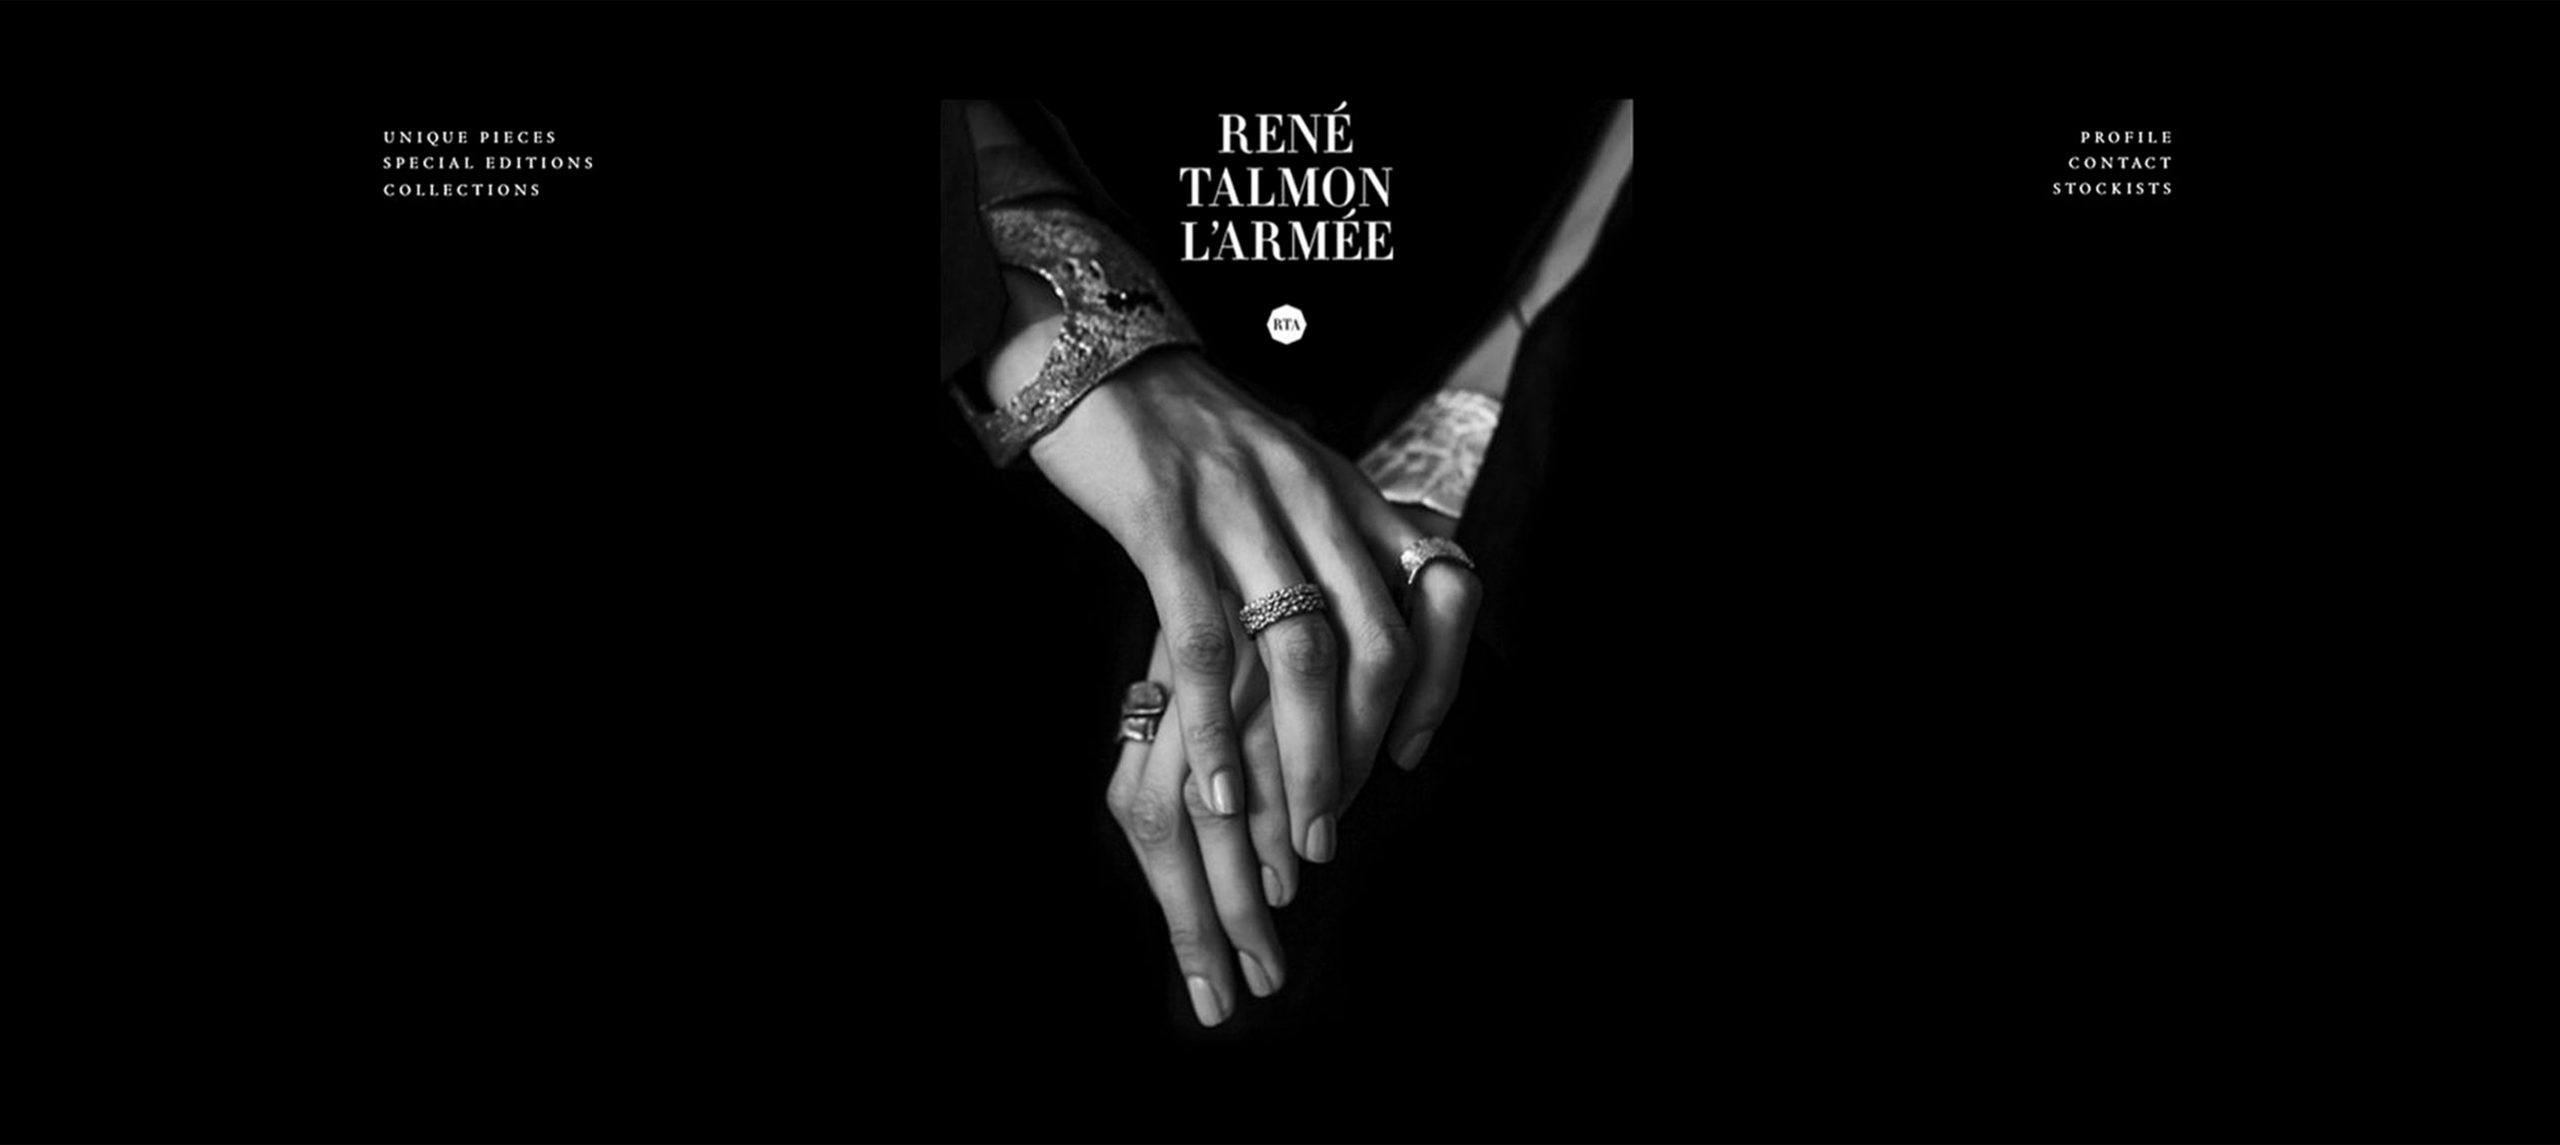 Studio Last - René Talmon L'Armée –Website